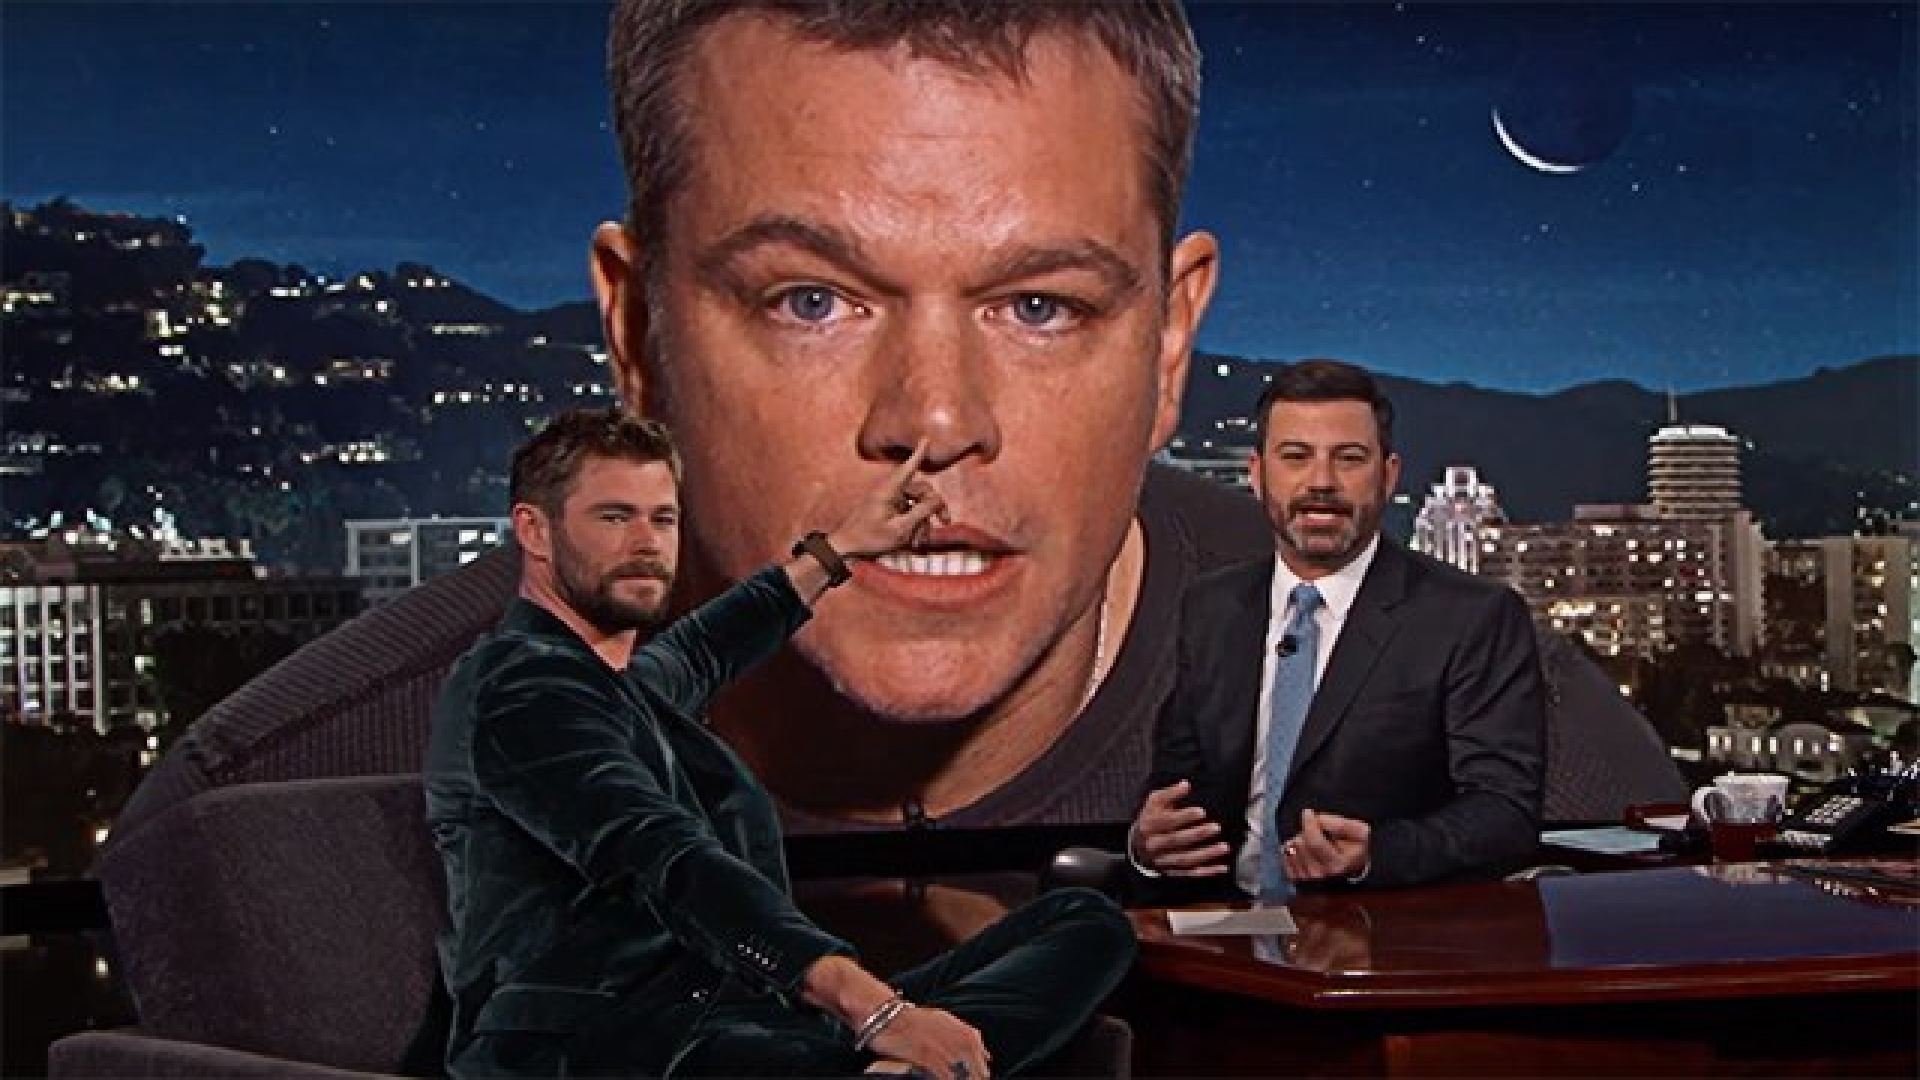 Matt-Damon-Chris-Hemsworth-Jimmy-Kimmel